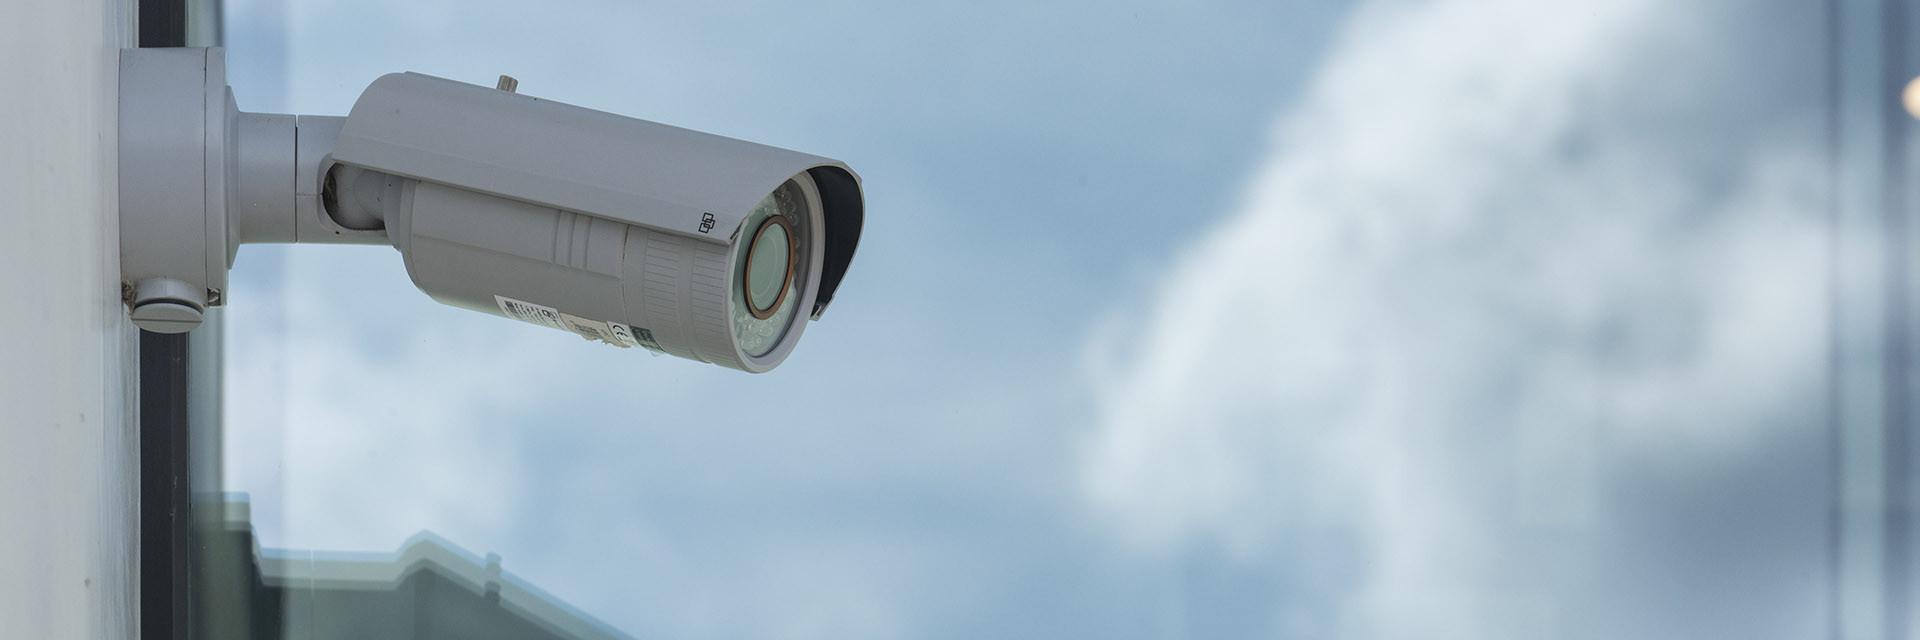 camerabewaking.jpg